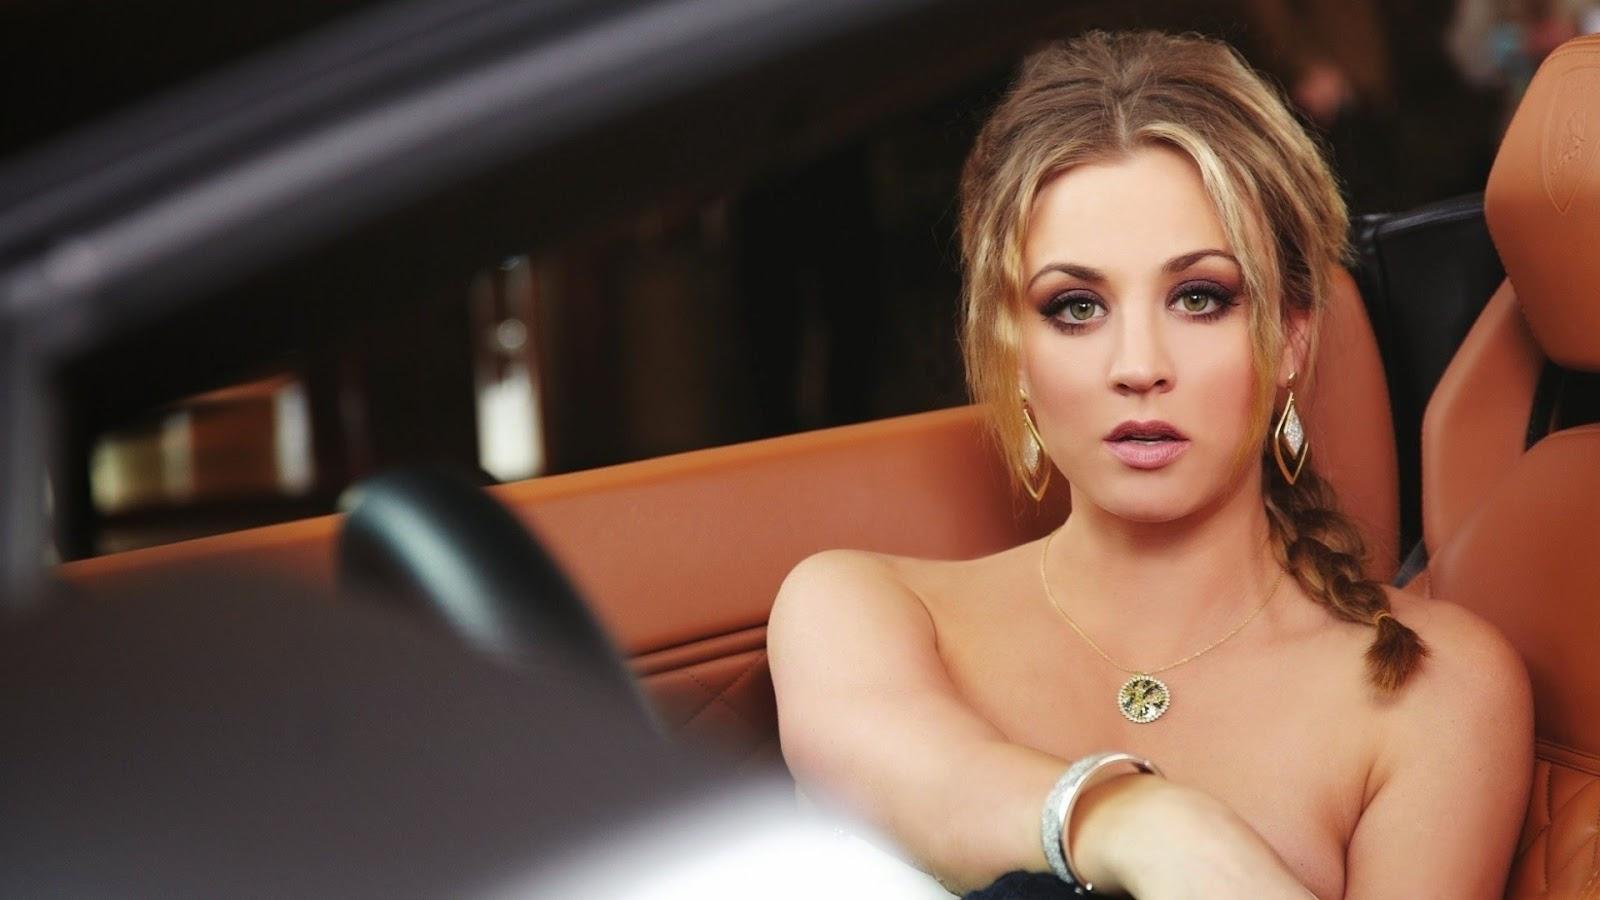 Actresses nude selfi Kaley Christine Cuoco-Sweeting (/ˈkeɪliː ˈkwoʊkoʊ/ KAY-lee KWOH-koh) (born November 30, 1985 in Camarillo, California, U.S.A.) is an American actress, ...